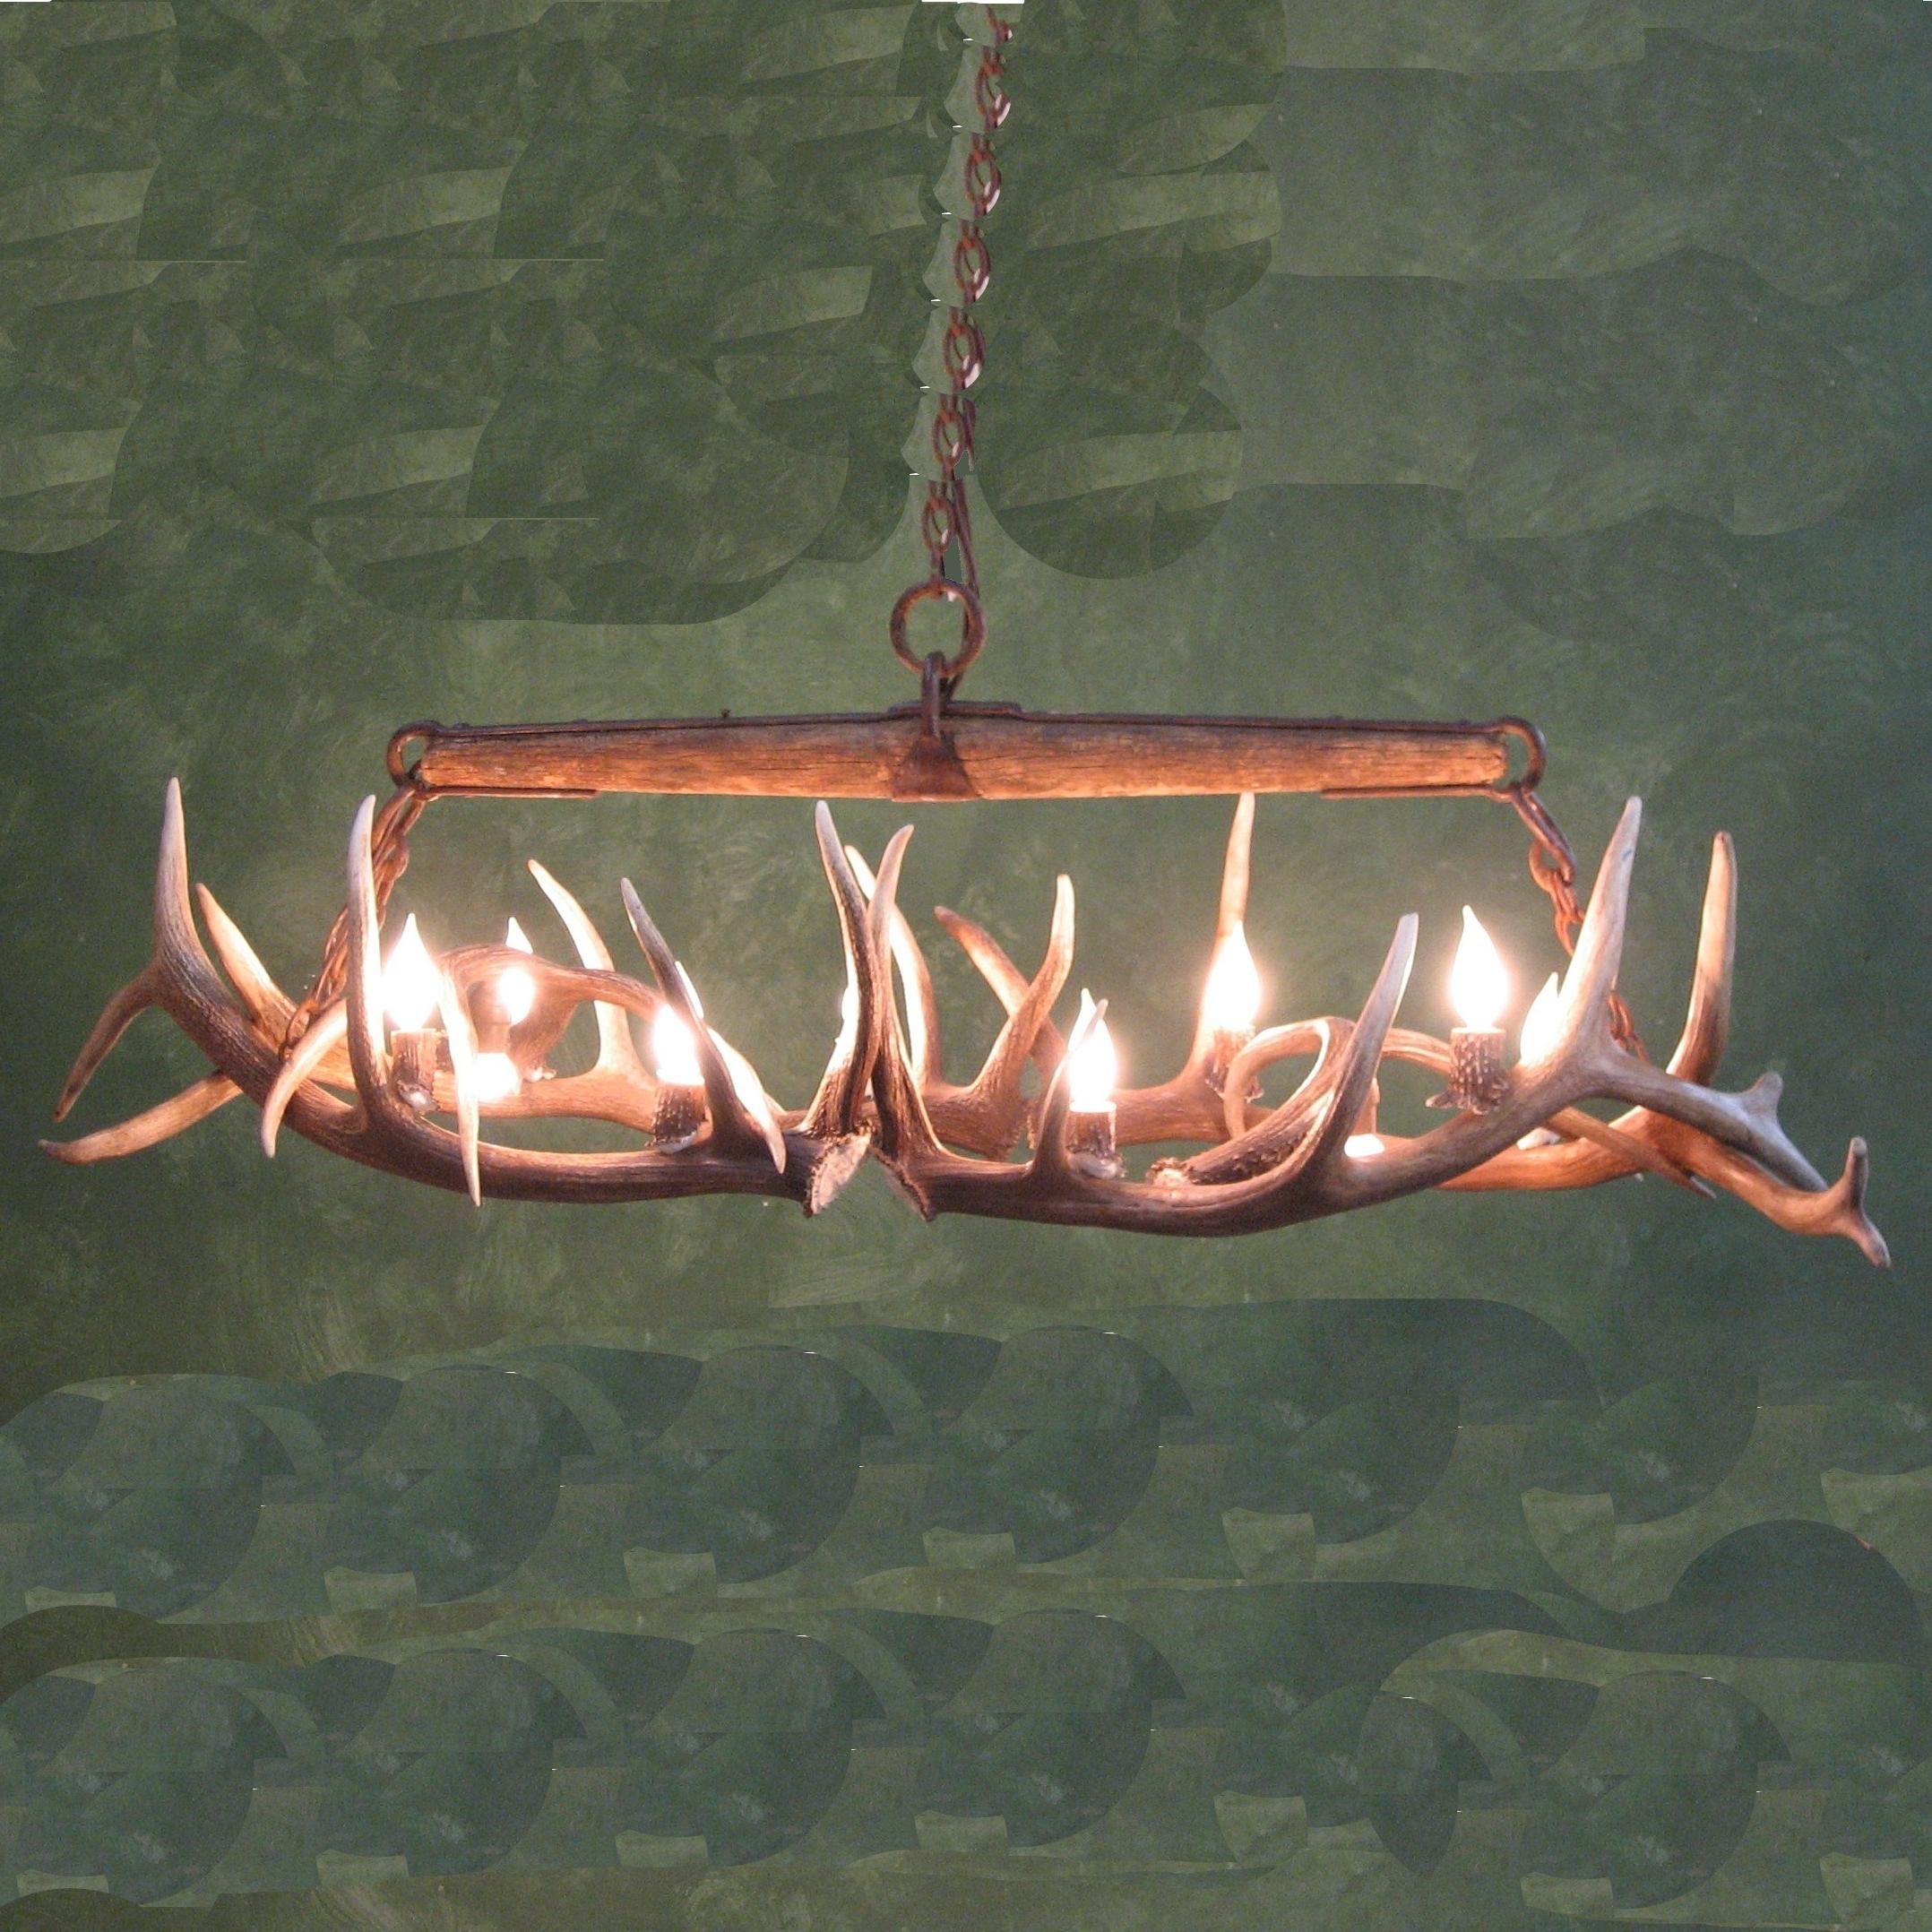 Popular Lighting: Elk Antler Chandelier For Inspiring Unique Lighting Design Within Stag Horn Chandelier (View 11 of 20)